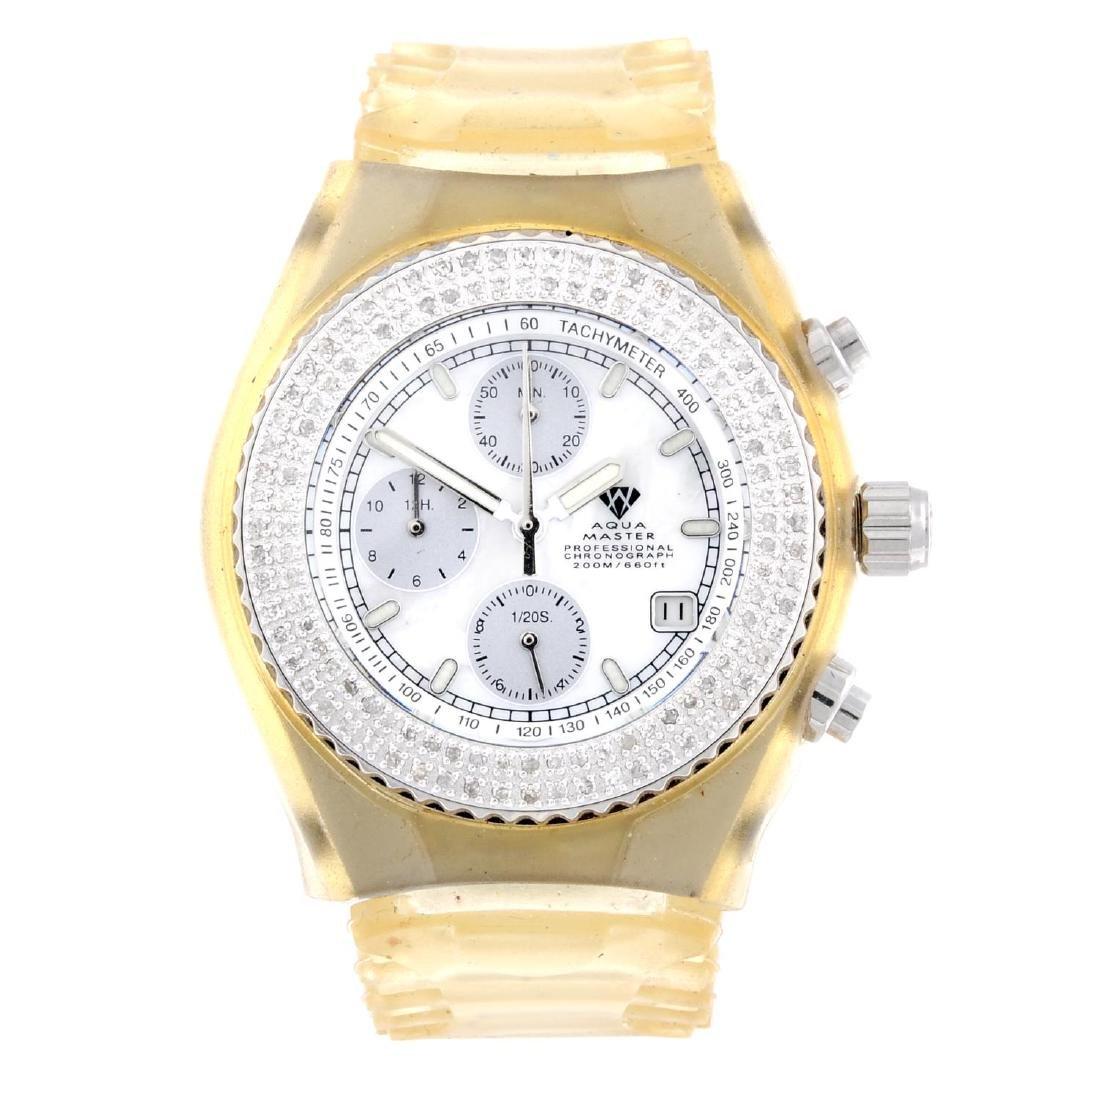 AQUA MASTER - a lady's chronograph wrist watch. Plastic